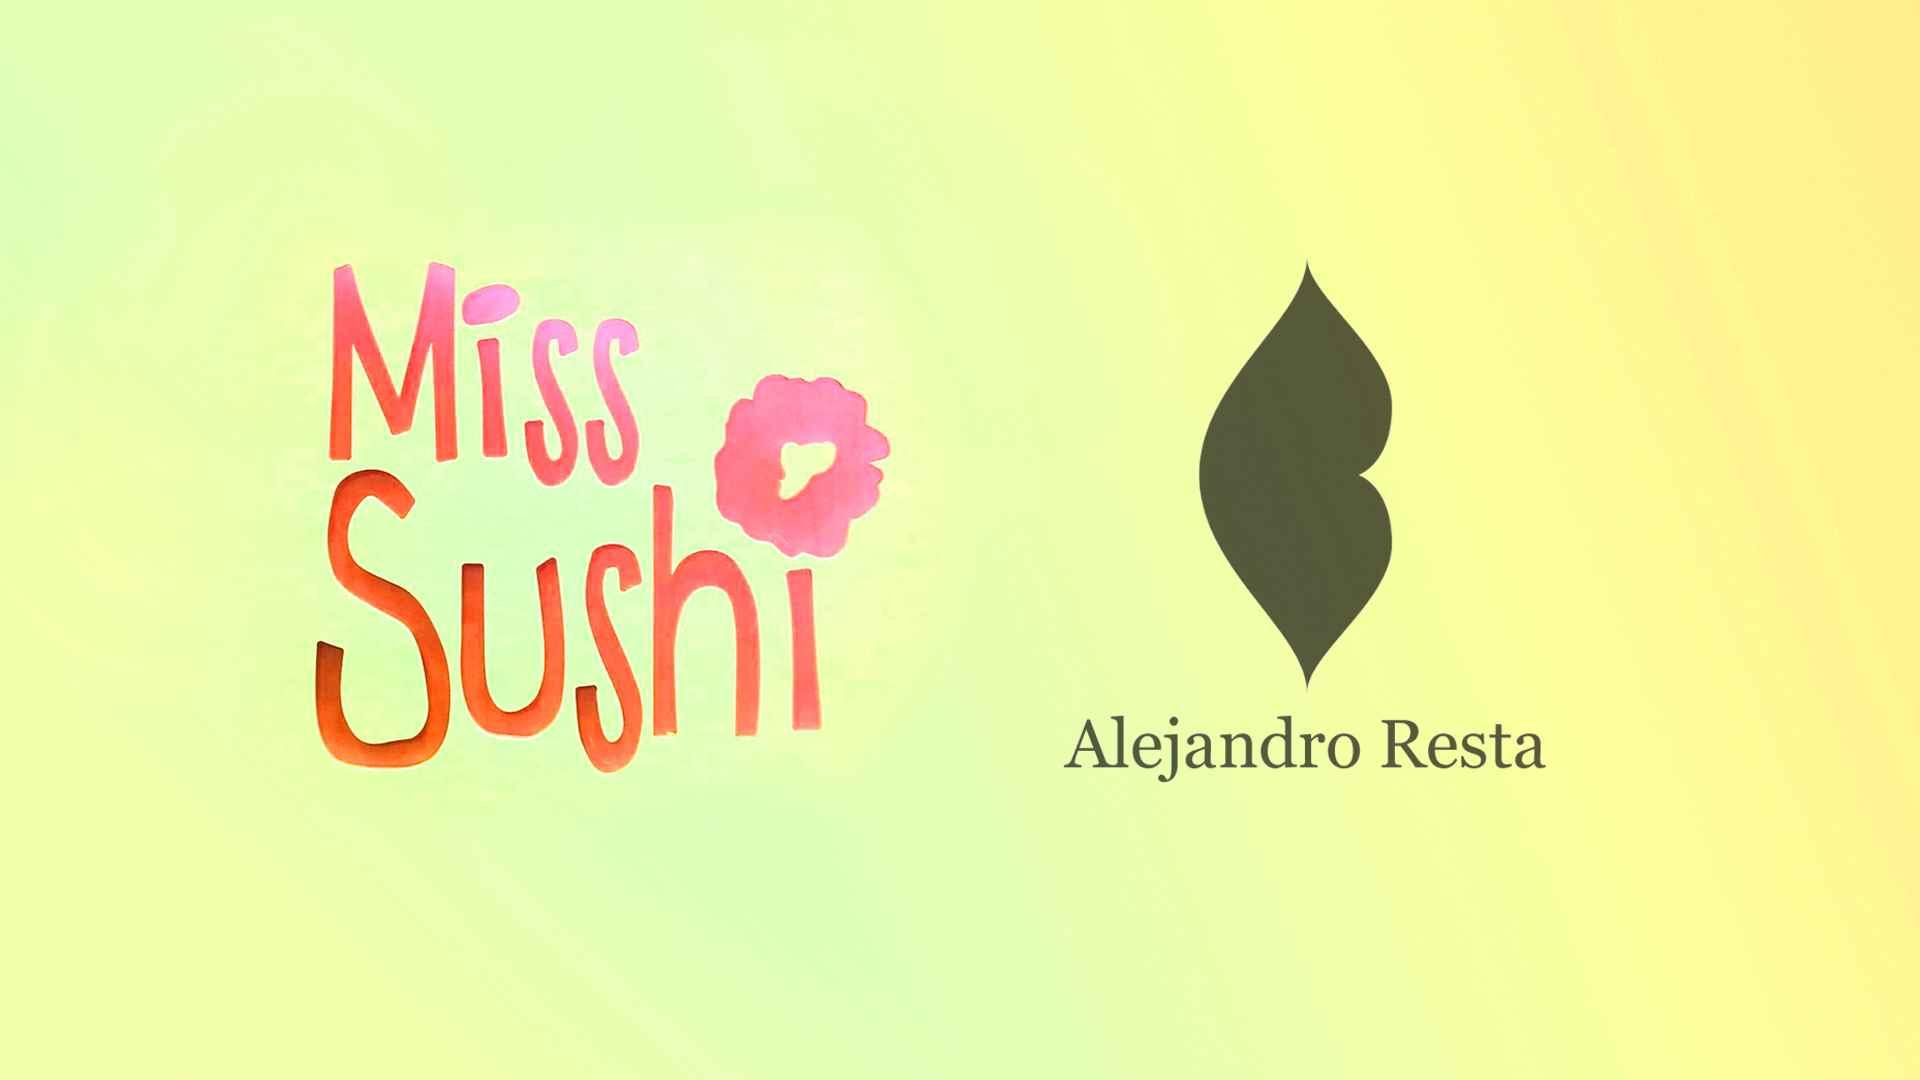 Desfile de Alejandro Resta en Miss Sushi